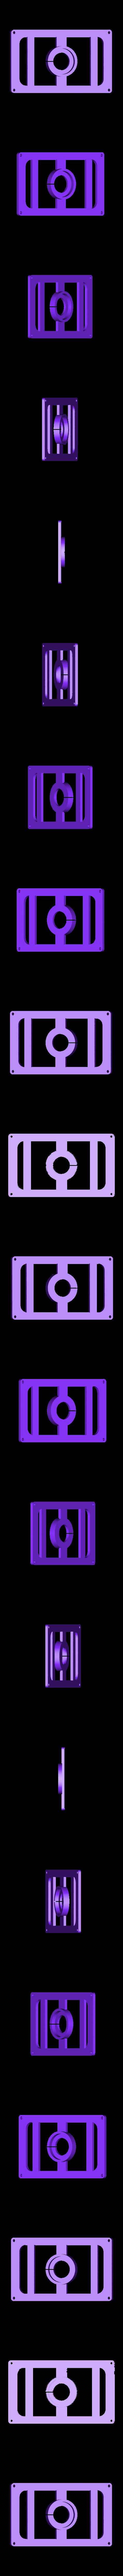 battery_holder.stl Download free STL file Guardian Shield+ Zelda Breath of the Wild • 3D print object, Adafruit